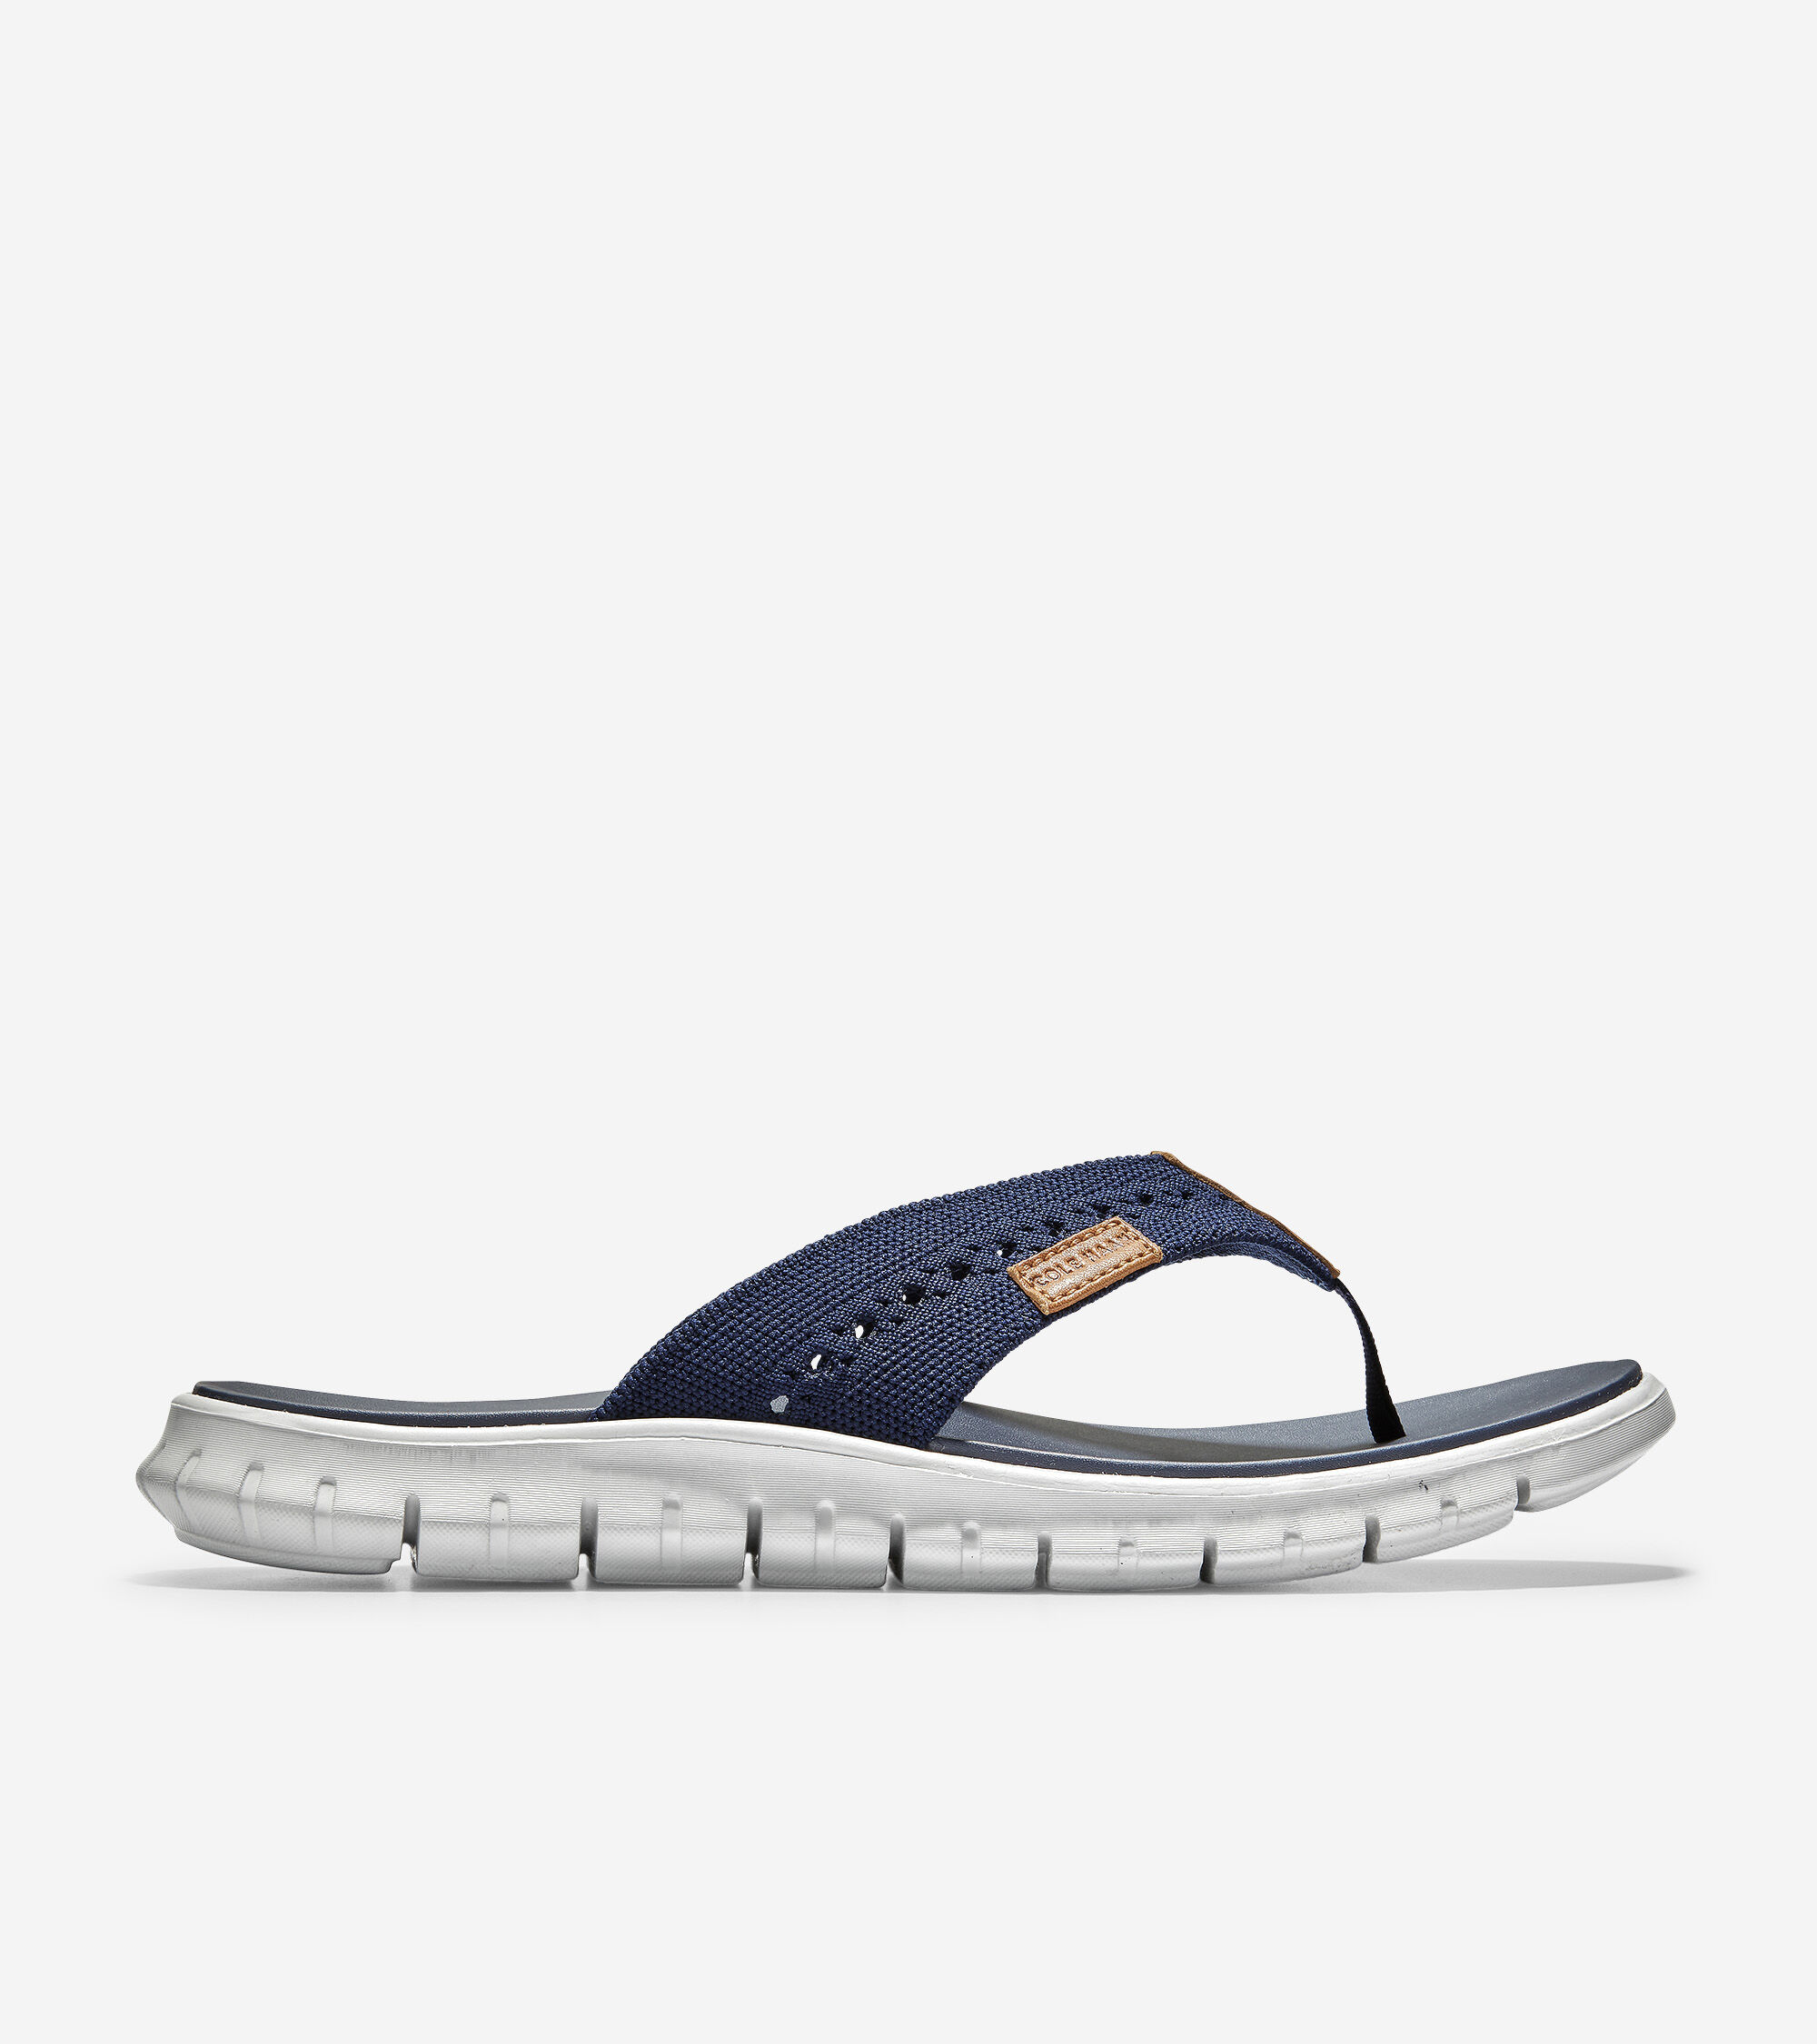 Thong Sandal in Marine Blue Stitchlite